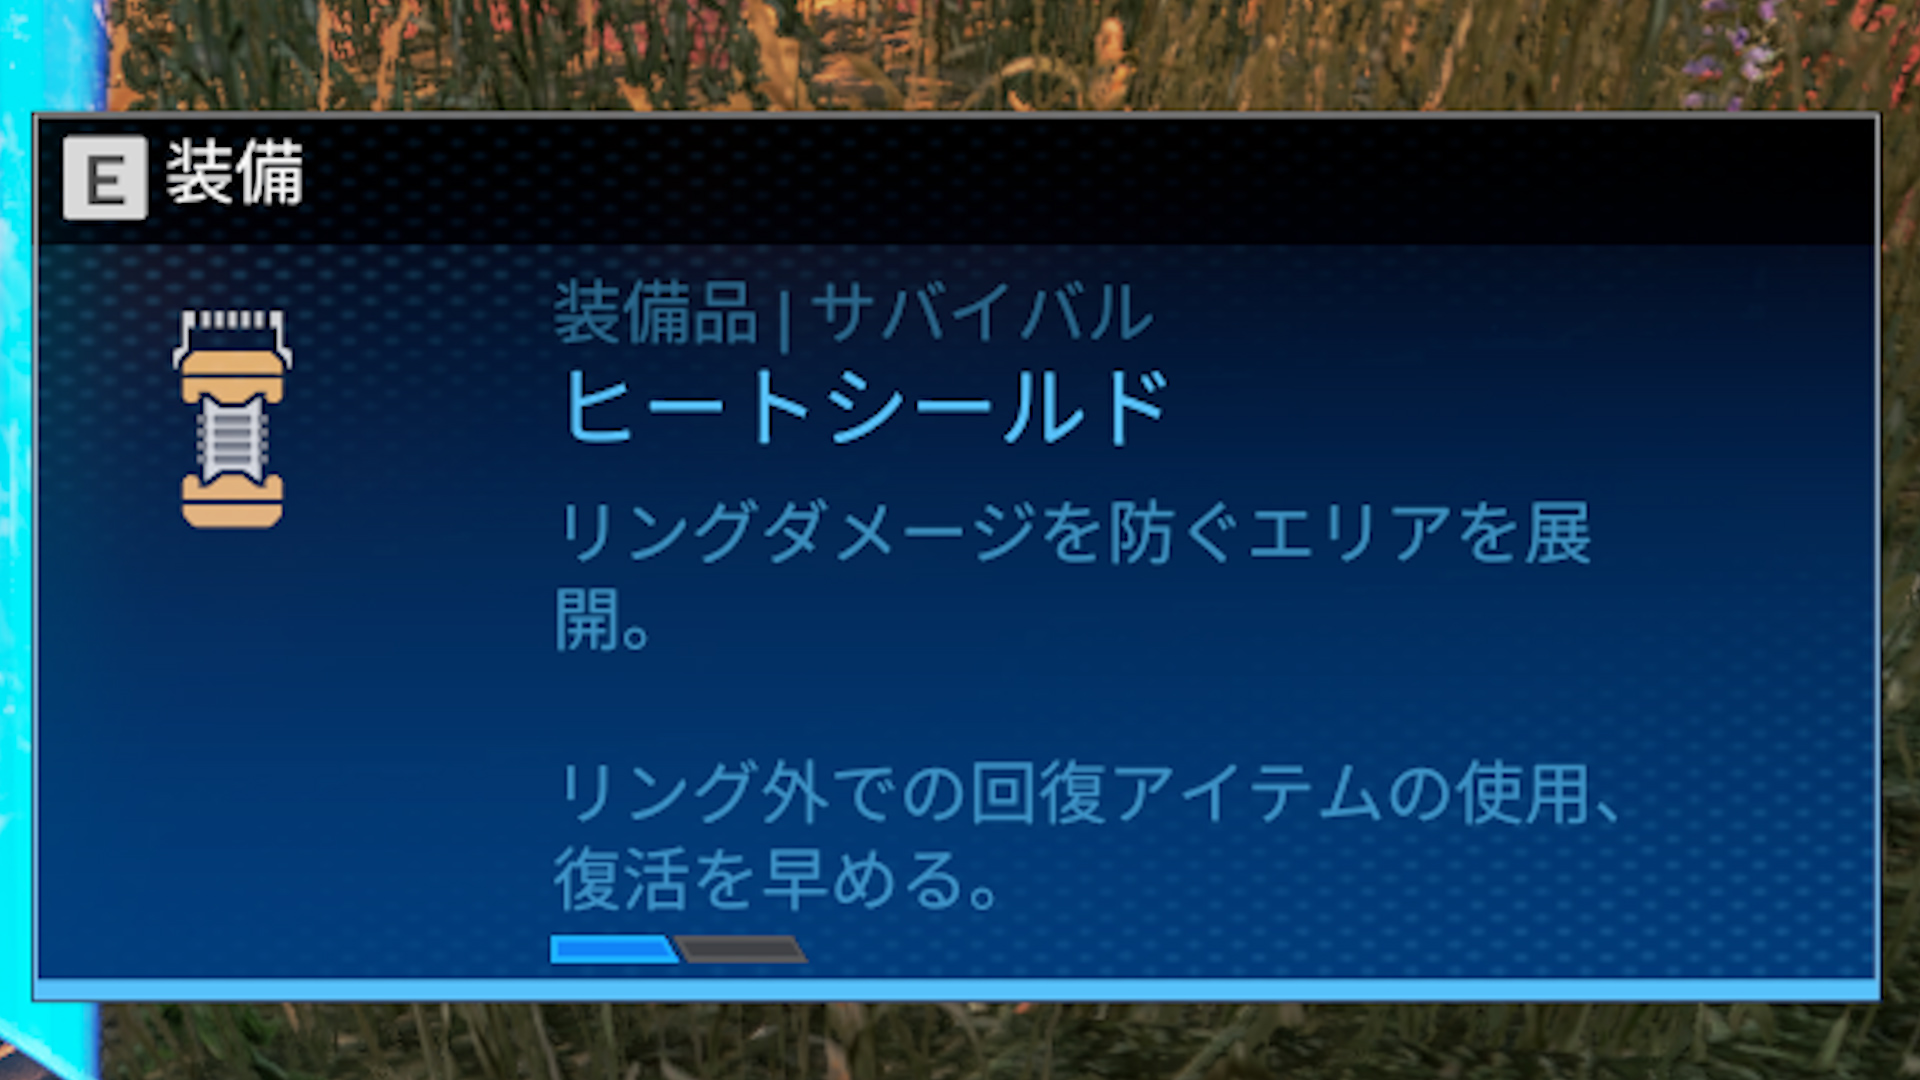 【APEX】ヒートシールドの調整アプデが新たに適応!→「高速回復」の効果が削除されランクでもヒートシールドが出現するようになった模様